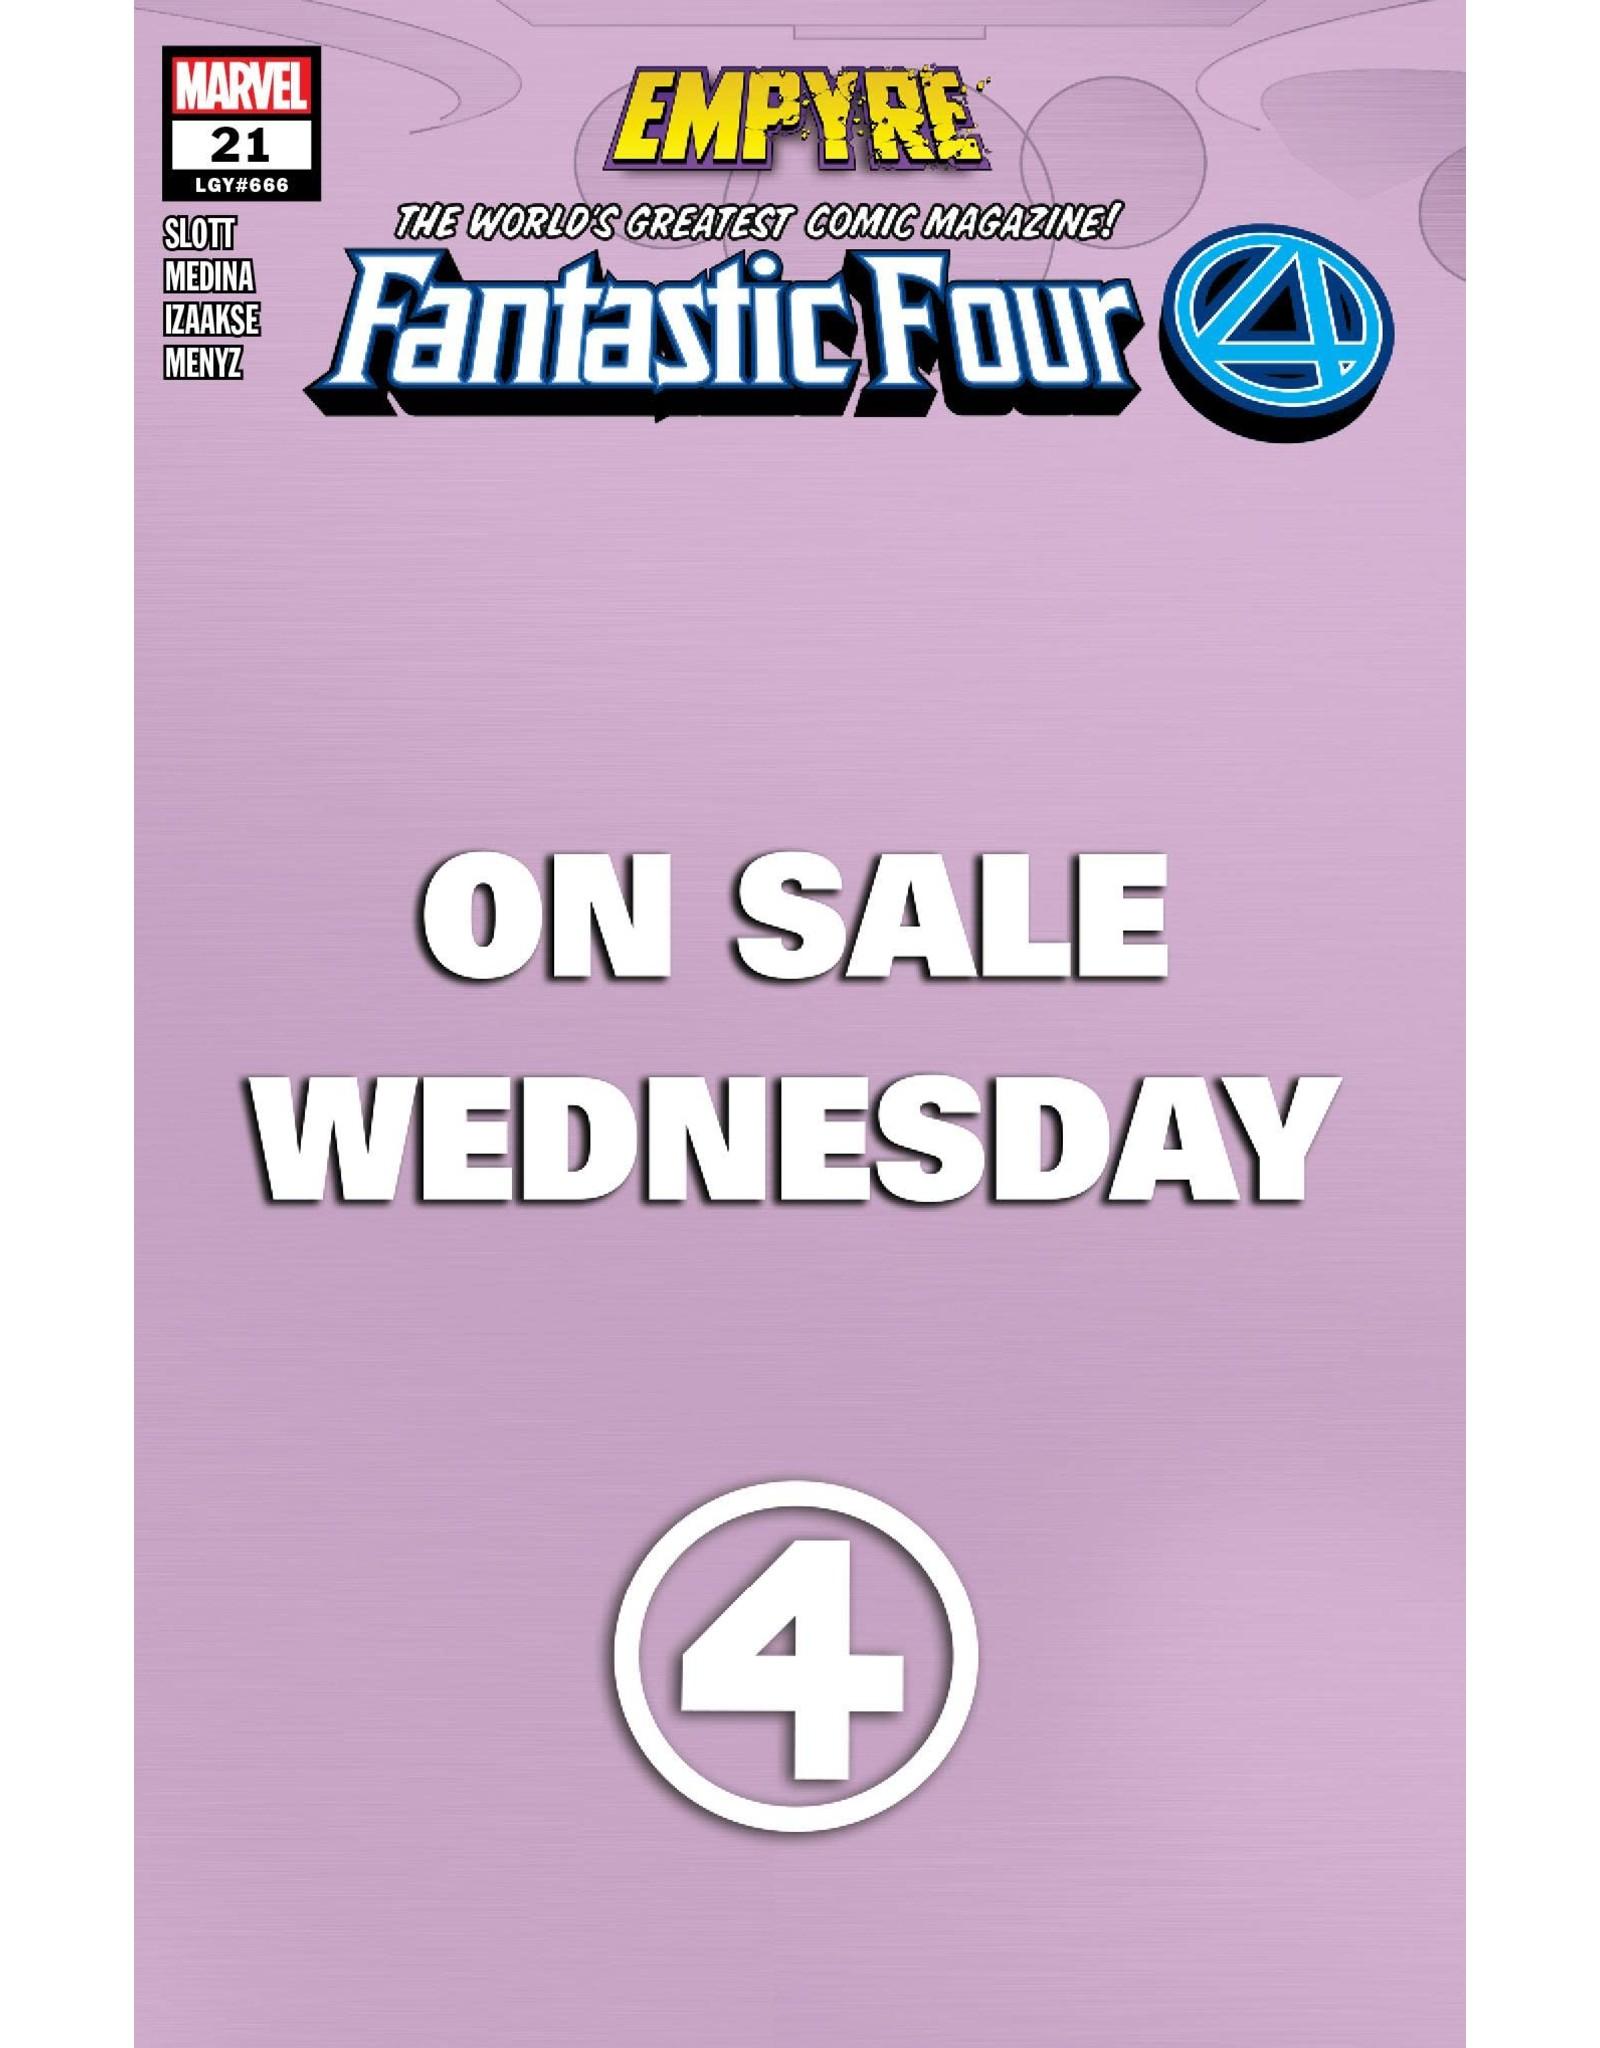 MARVEL COMICS FANTASTIC FOUR #21 MARVEL WEDNESDAY VAR EMP